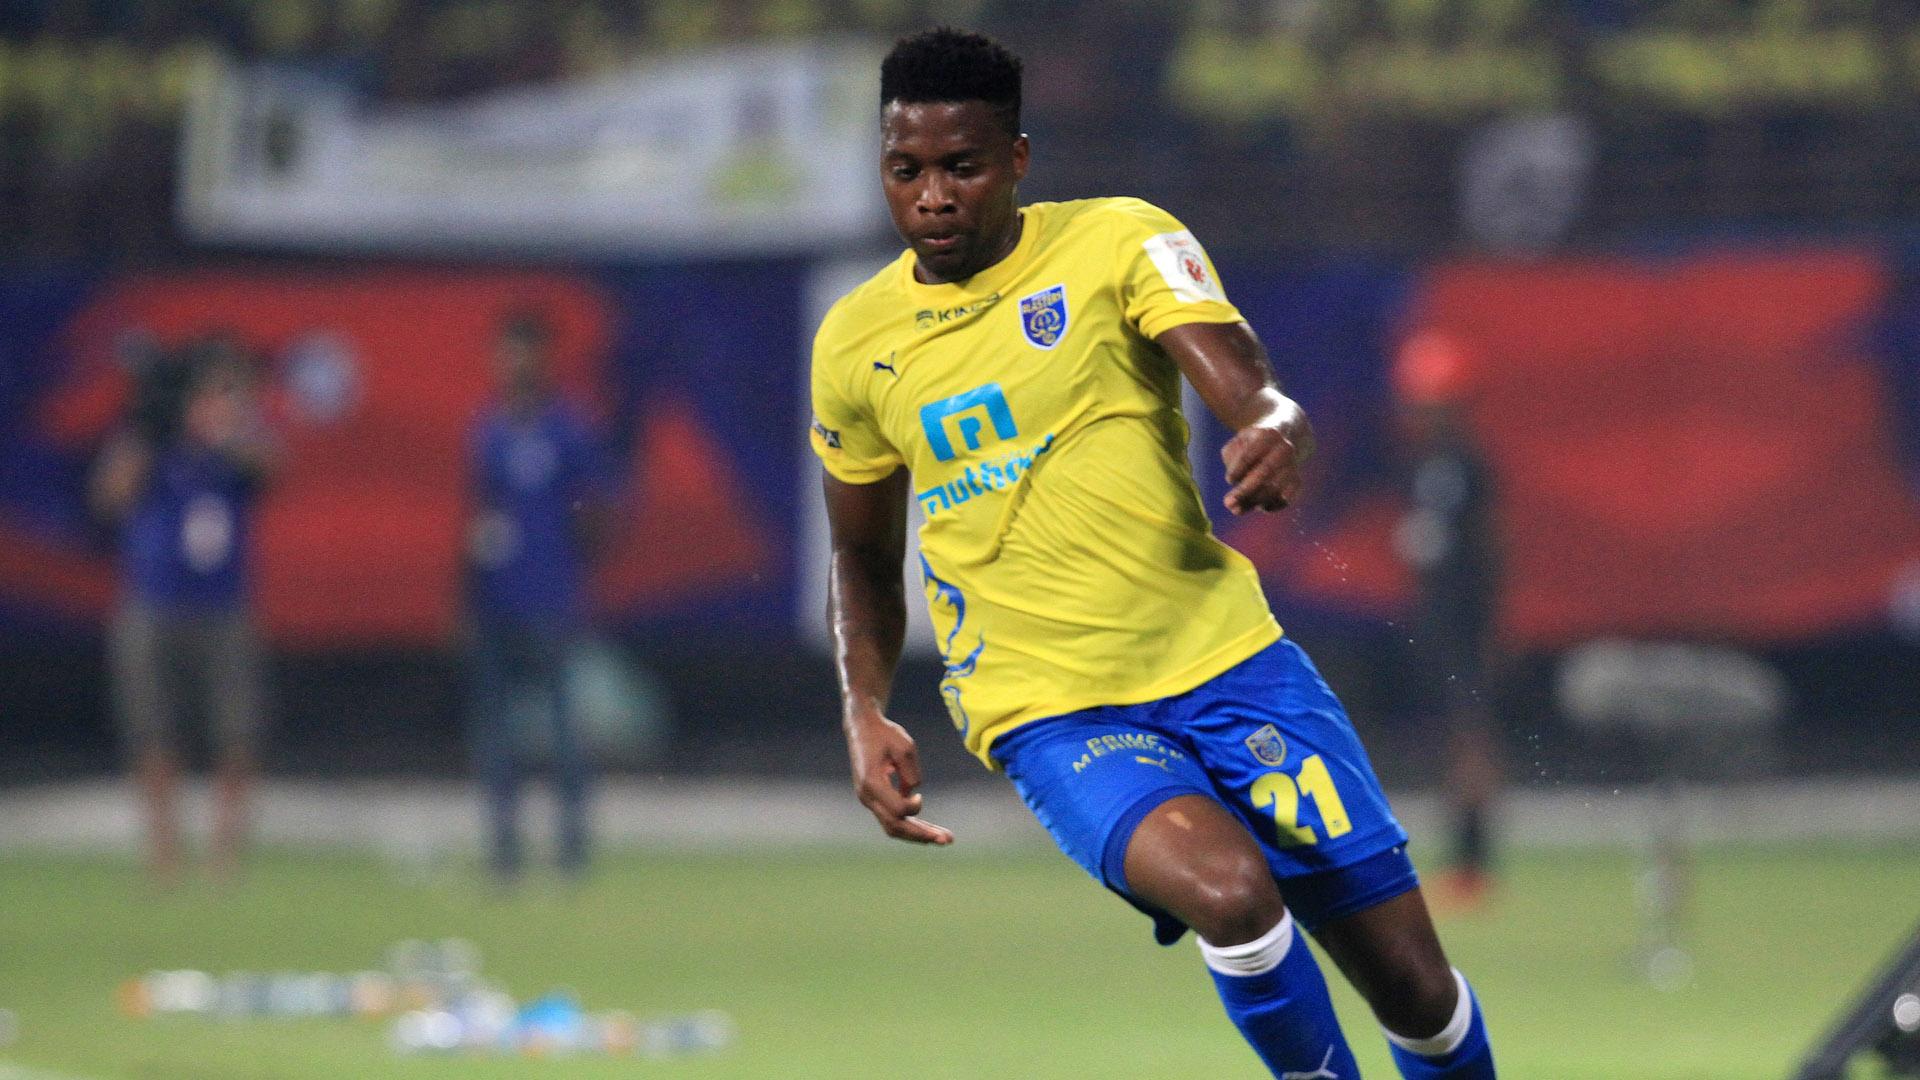 From Hume to Ogbeche | Who all are Kerala Blasters FC's Top Goalscorers 6 seasons apart antonio german kerala blasters fc atletico de kolkata isl season 2 fdijd9ujy4521gezqatvhel9t